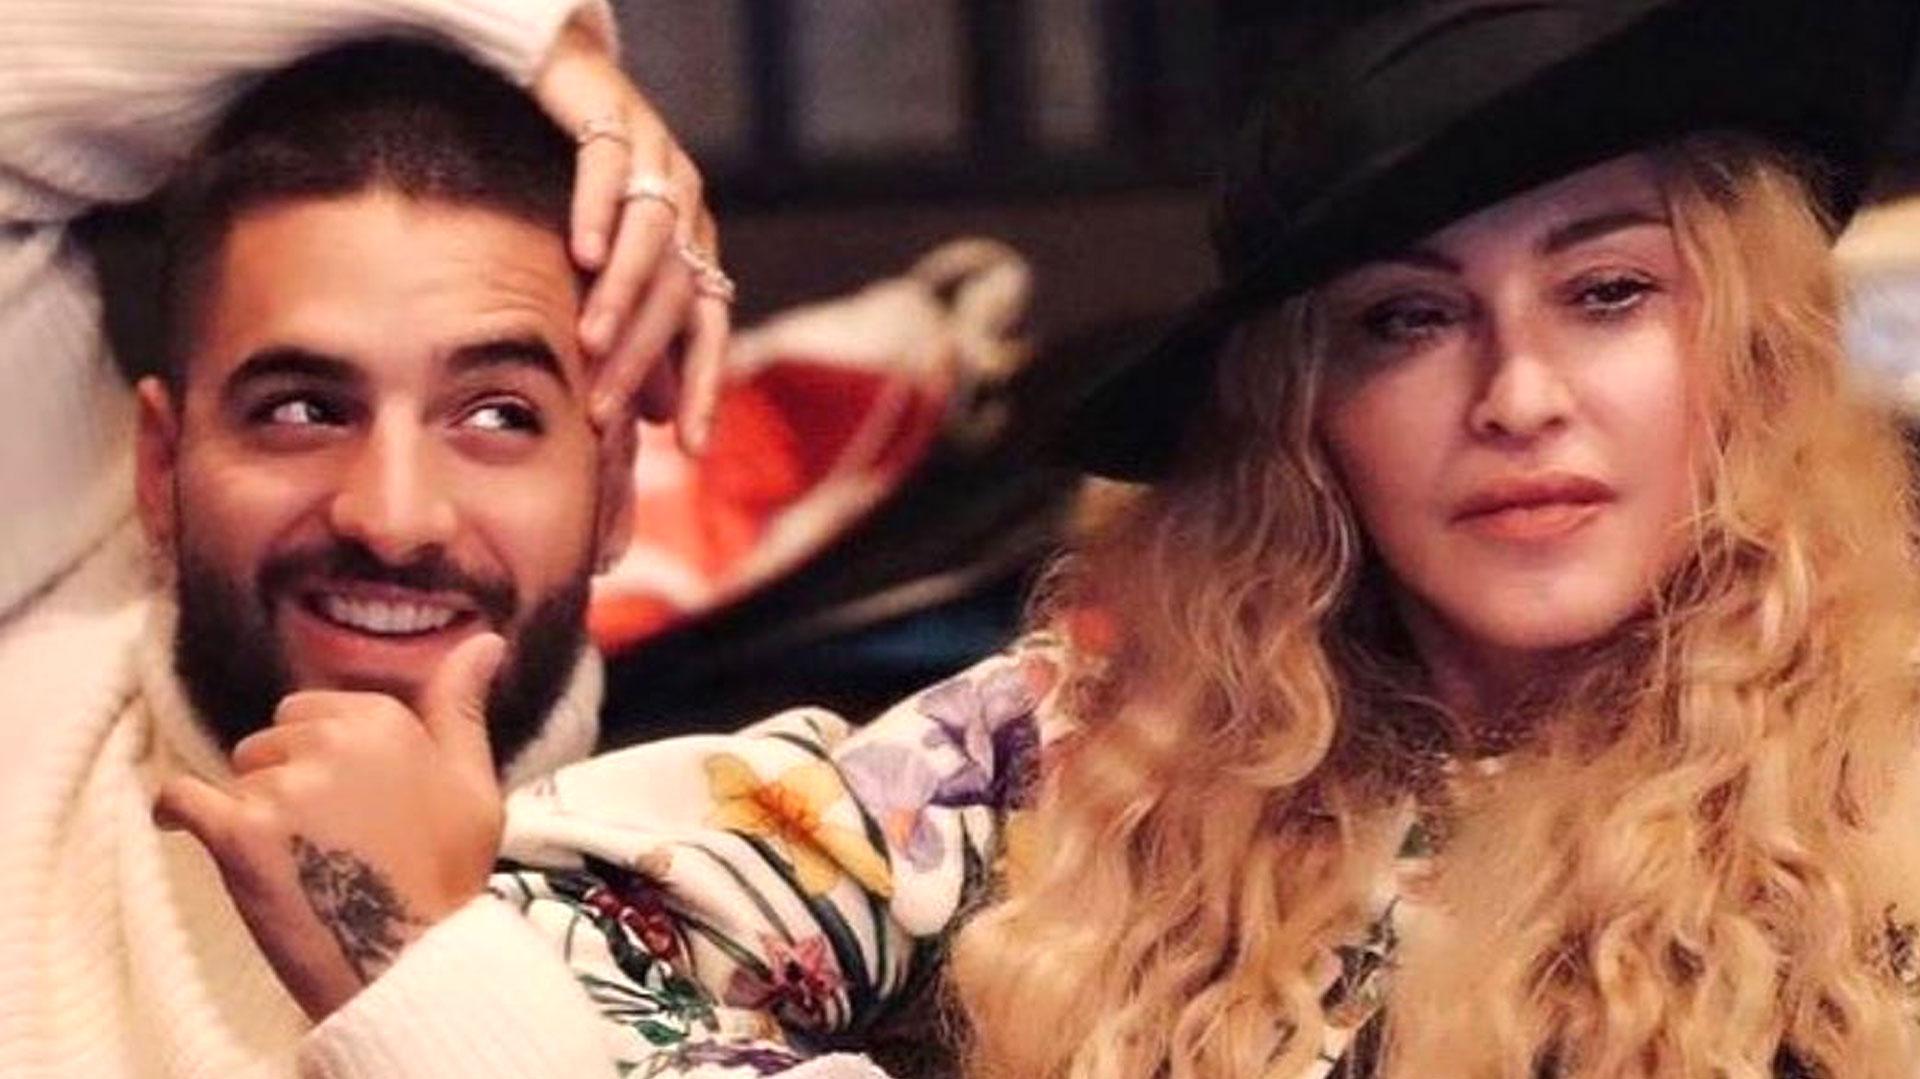 Madonna ha trabajado con Maluma, pero se desconocen detalles (Foto: Instagram /maluma)